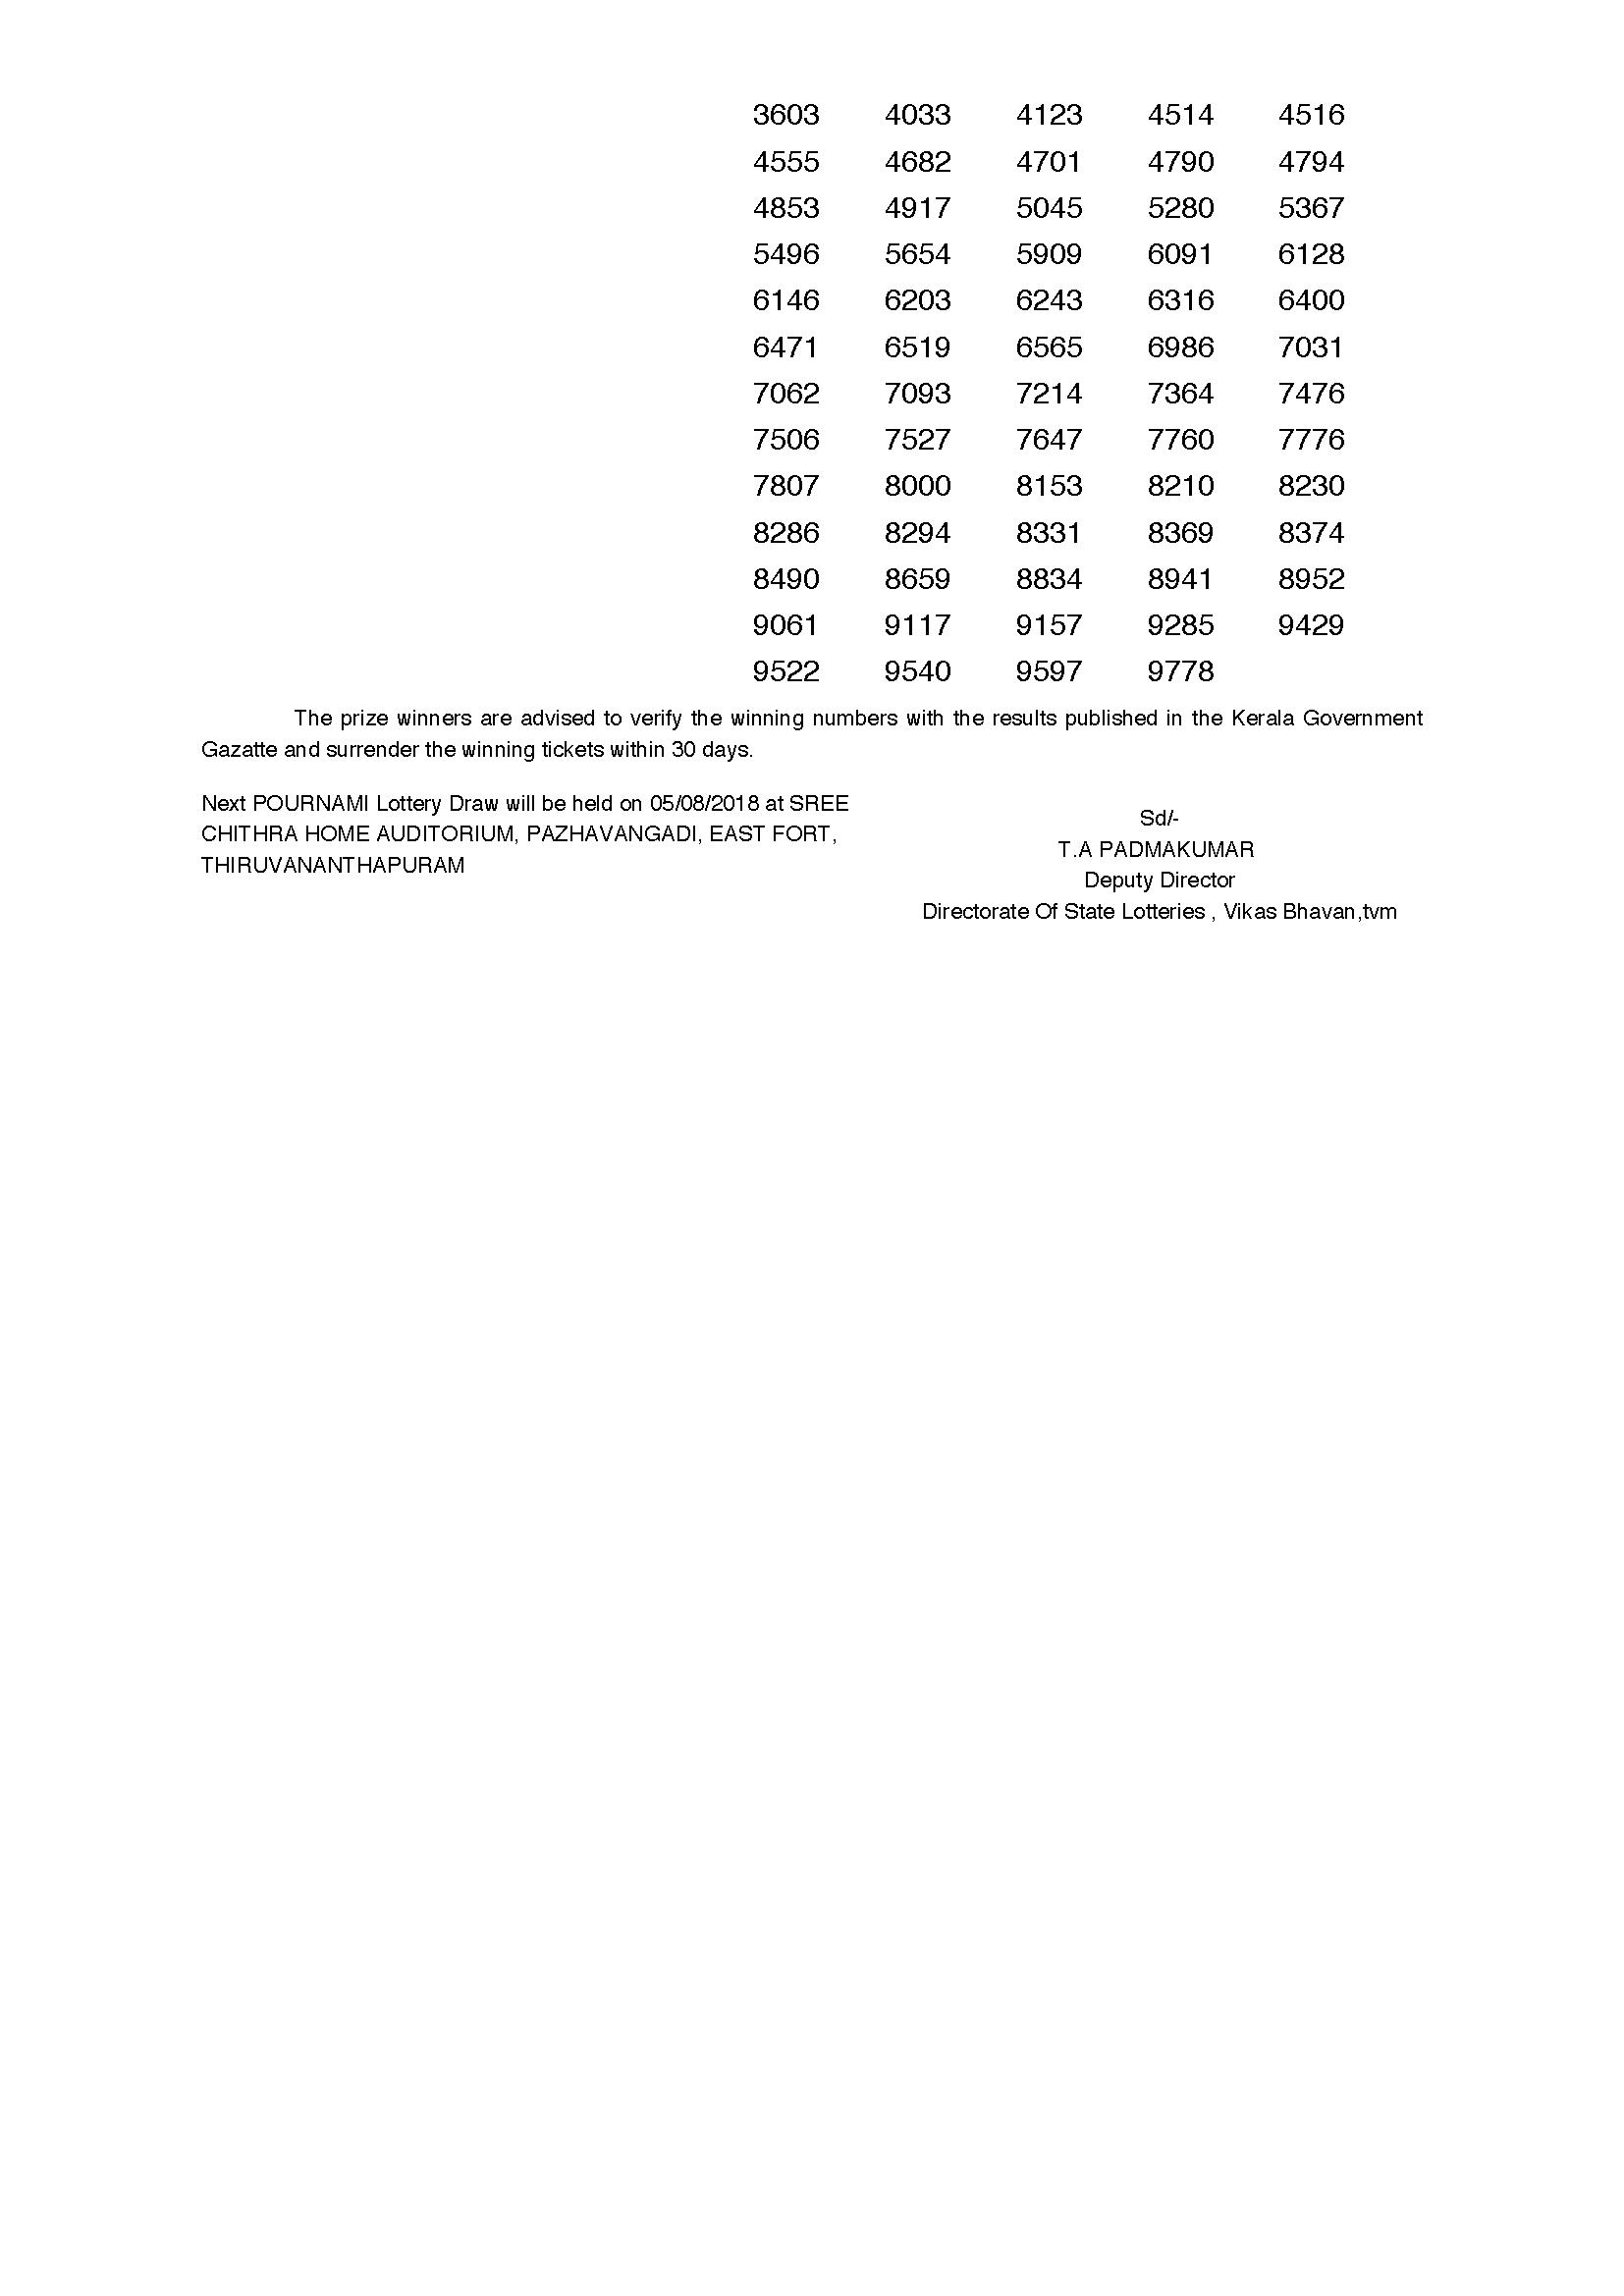 Pournami RN350 Kerala Lottery Results Screenshot: Page 2